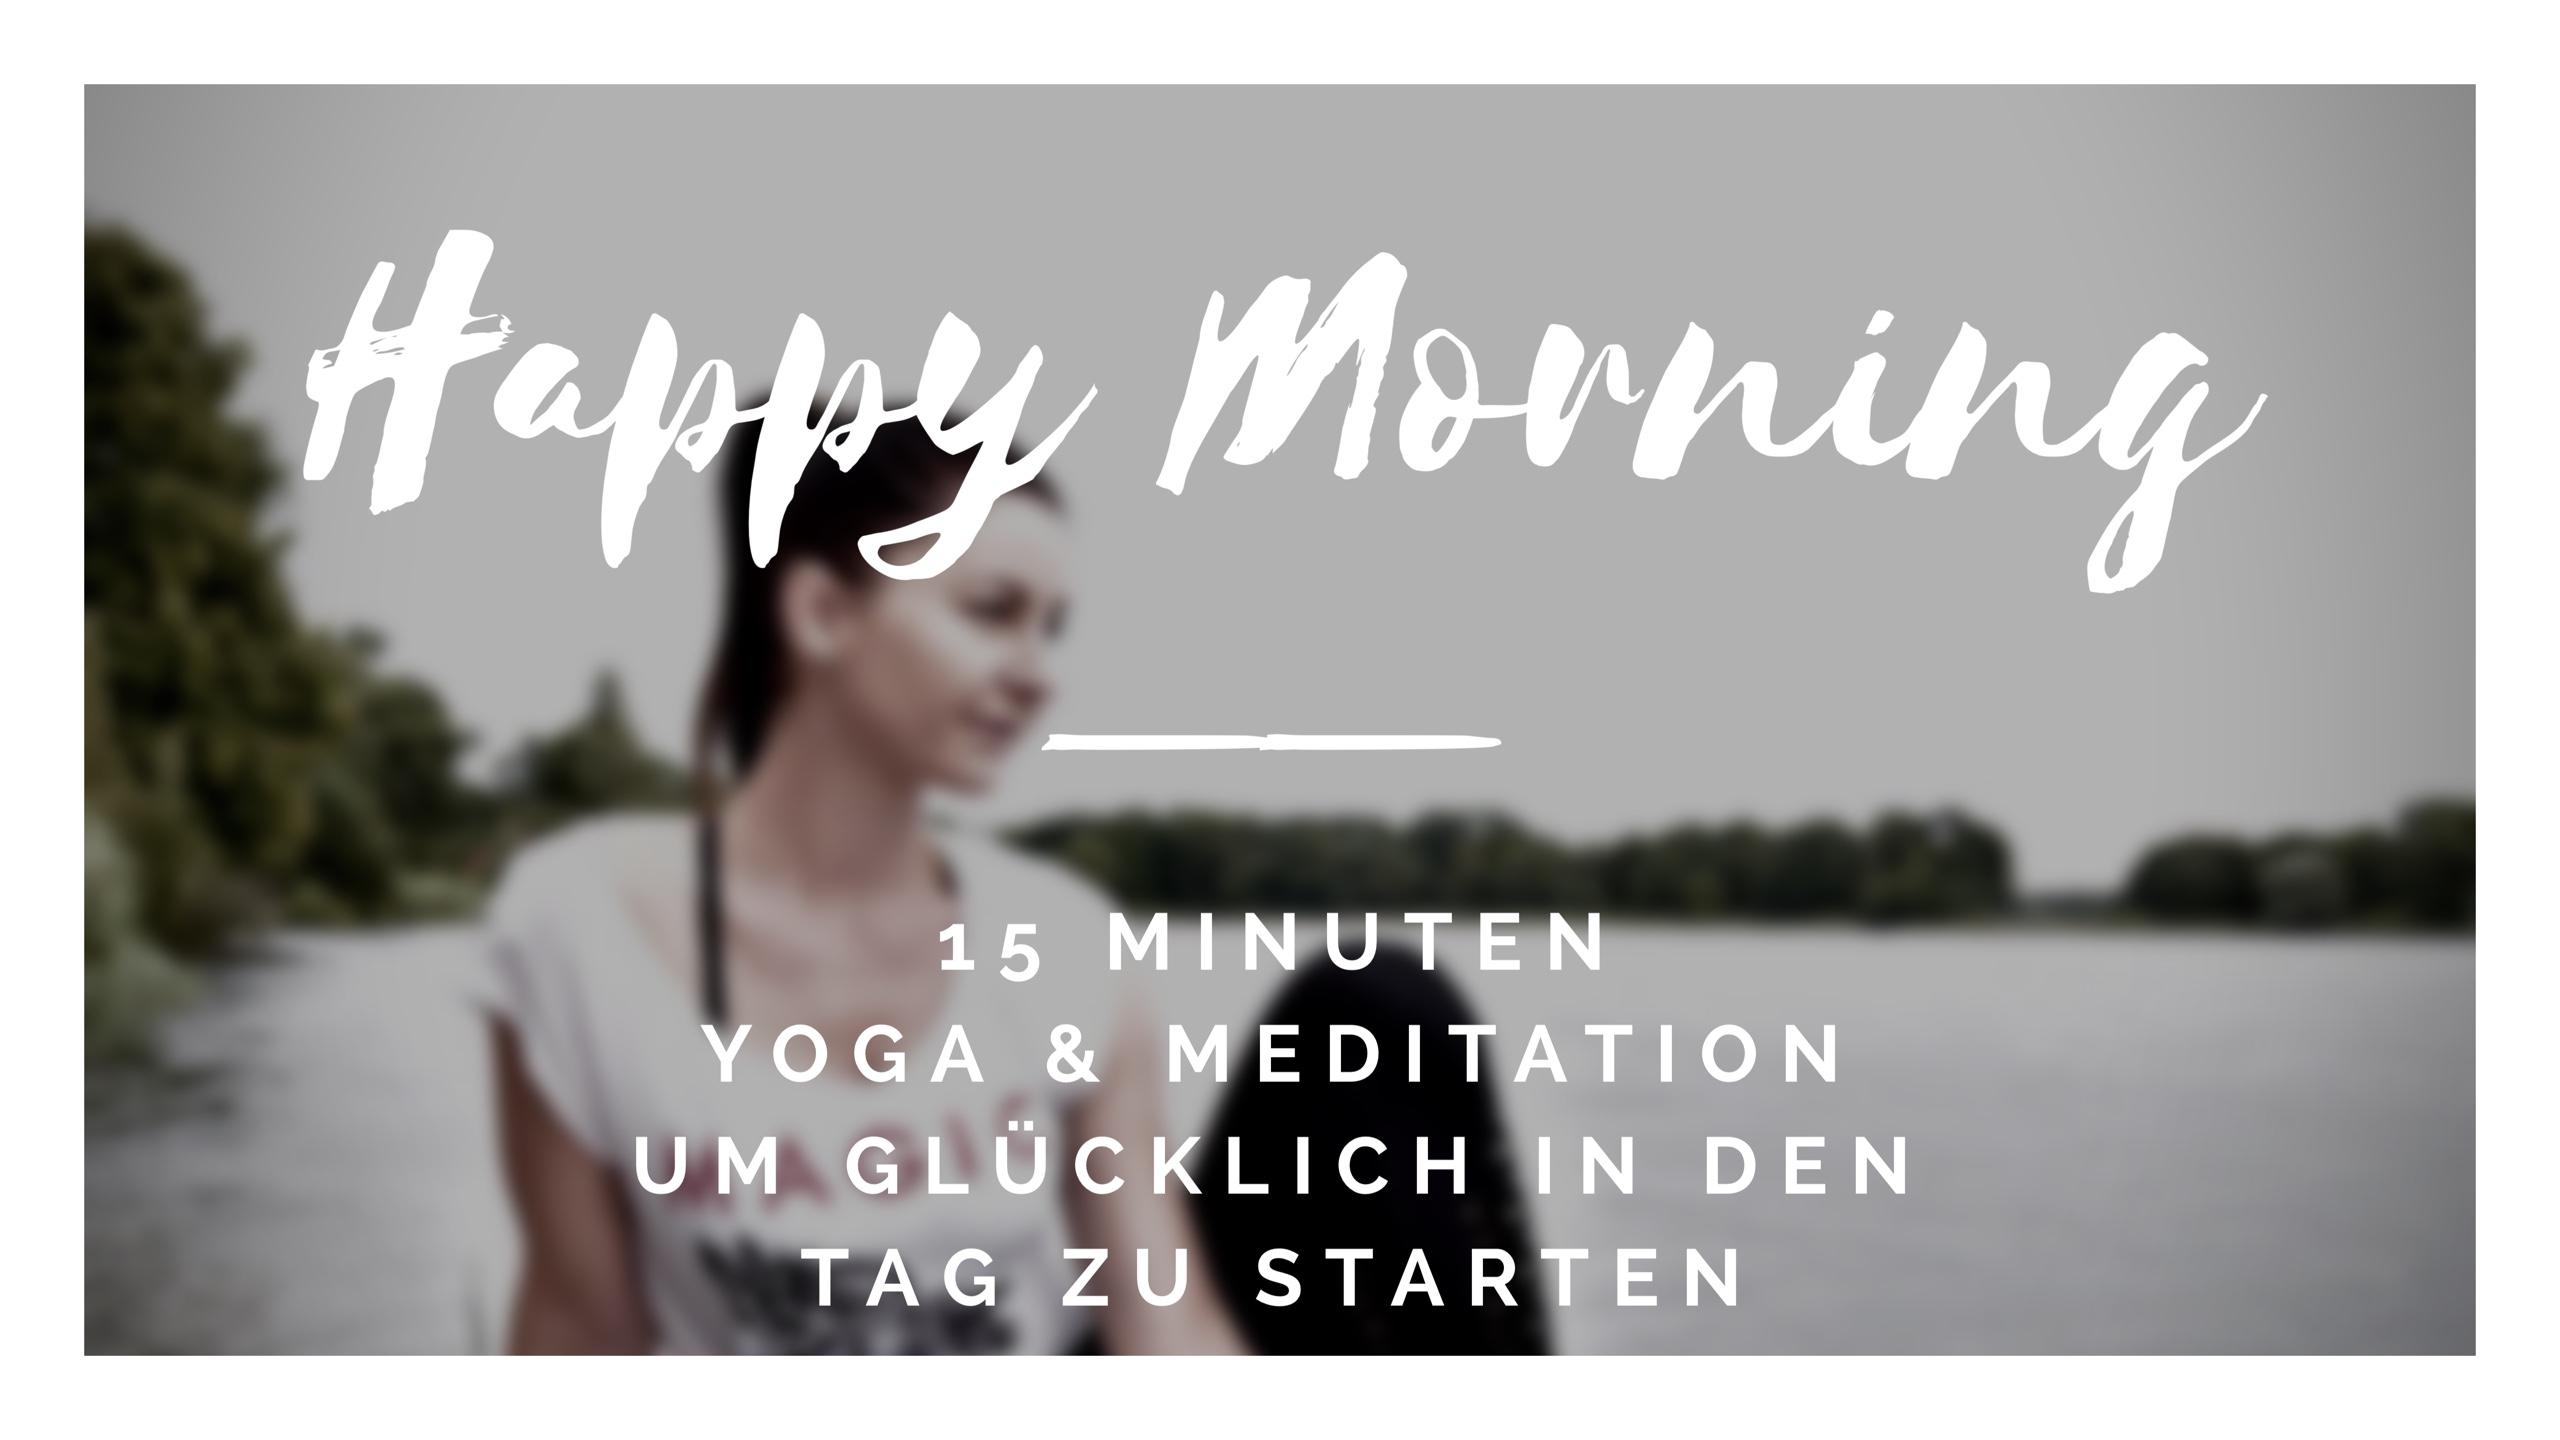 Happy Morning Yoga Flow│ Yoga für Anfänger │15 Minuten│Yoga & Meditation